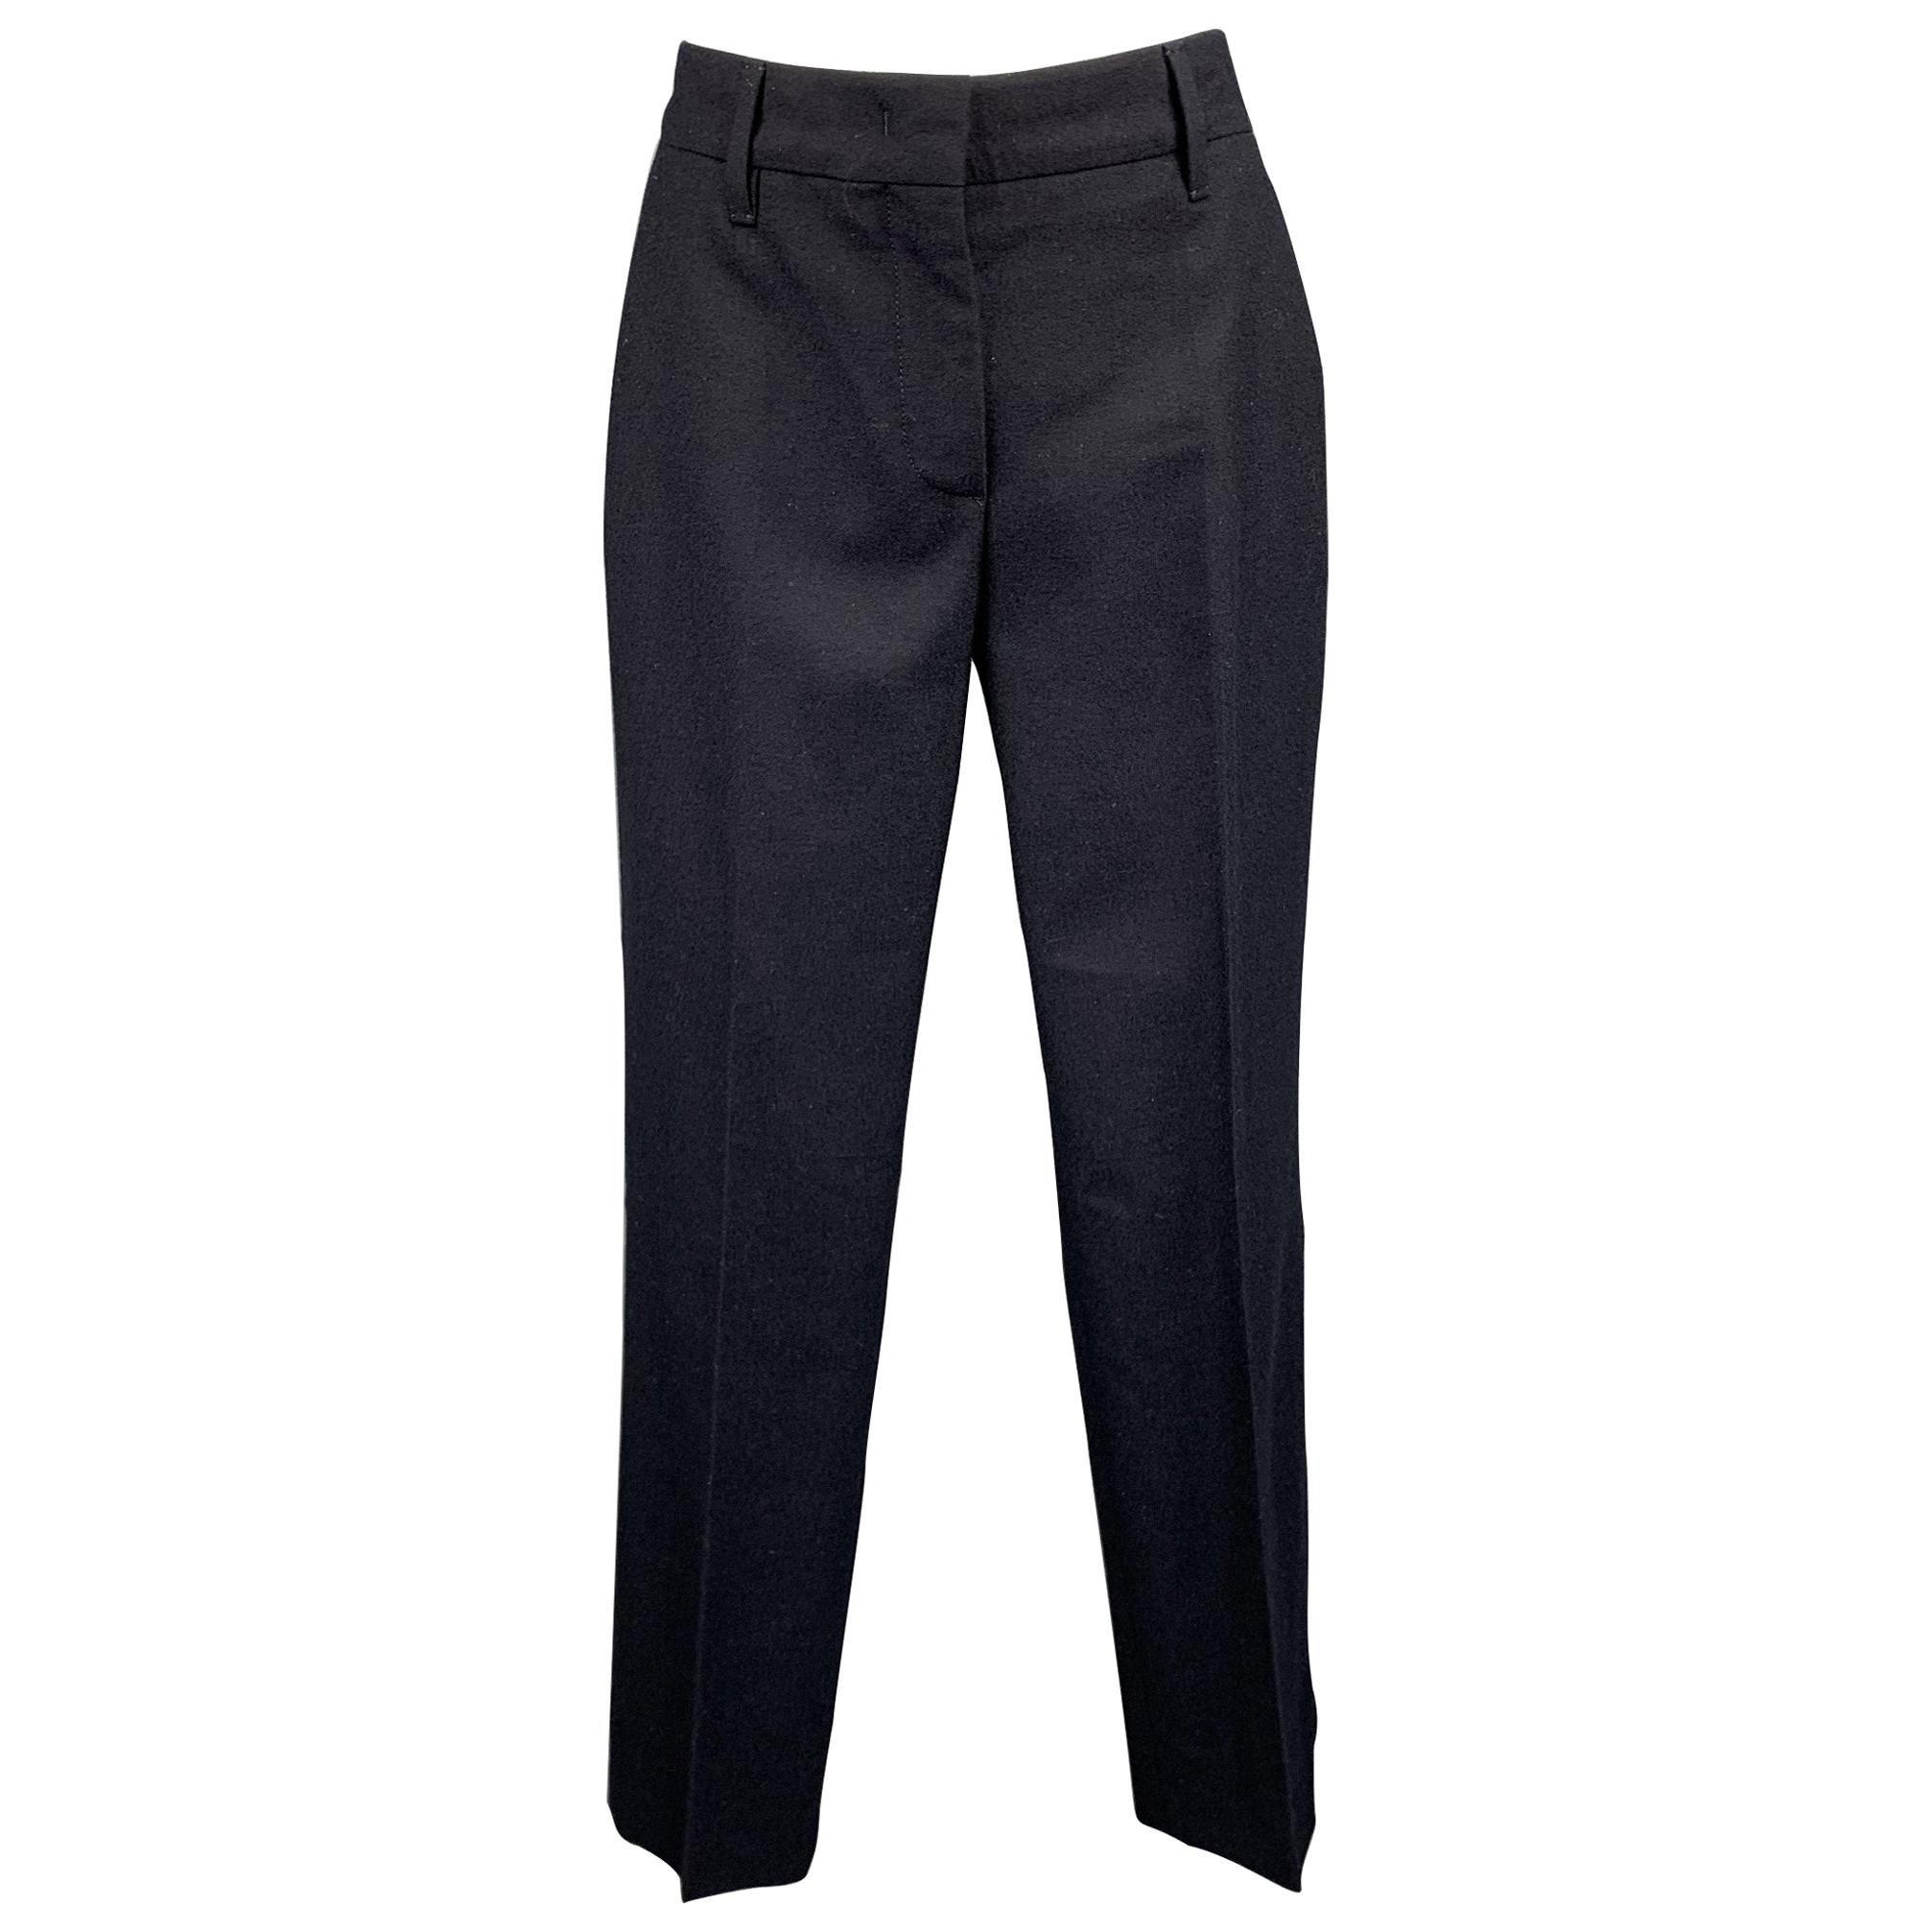 PRADA Size 2 Navy Virgin Wool Dress Pants